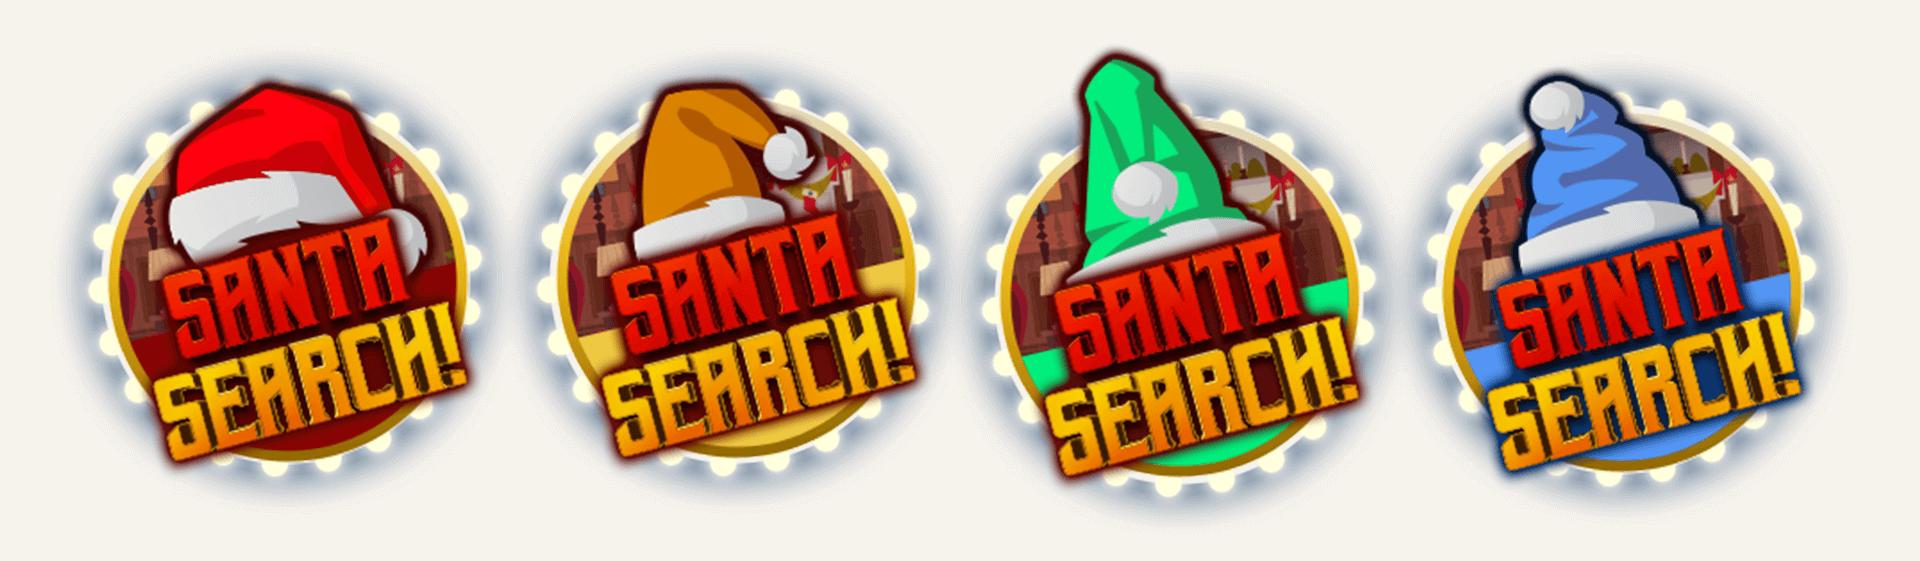 Santa Search - mFortune Christmas promotion 2020 - Santa hat icon